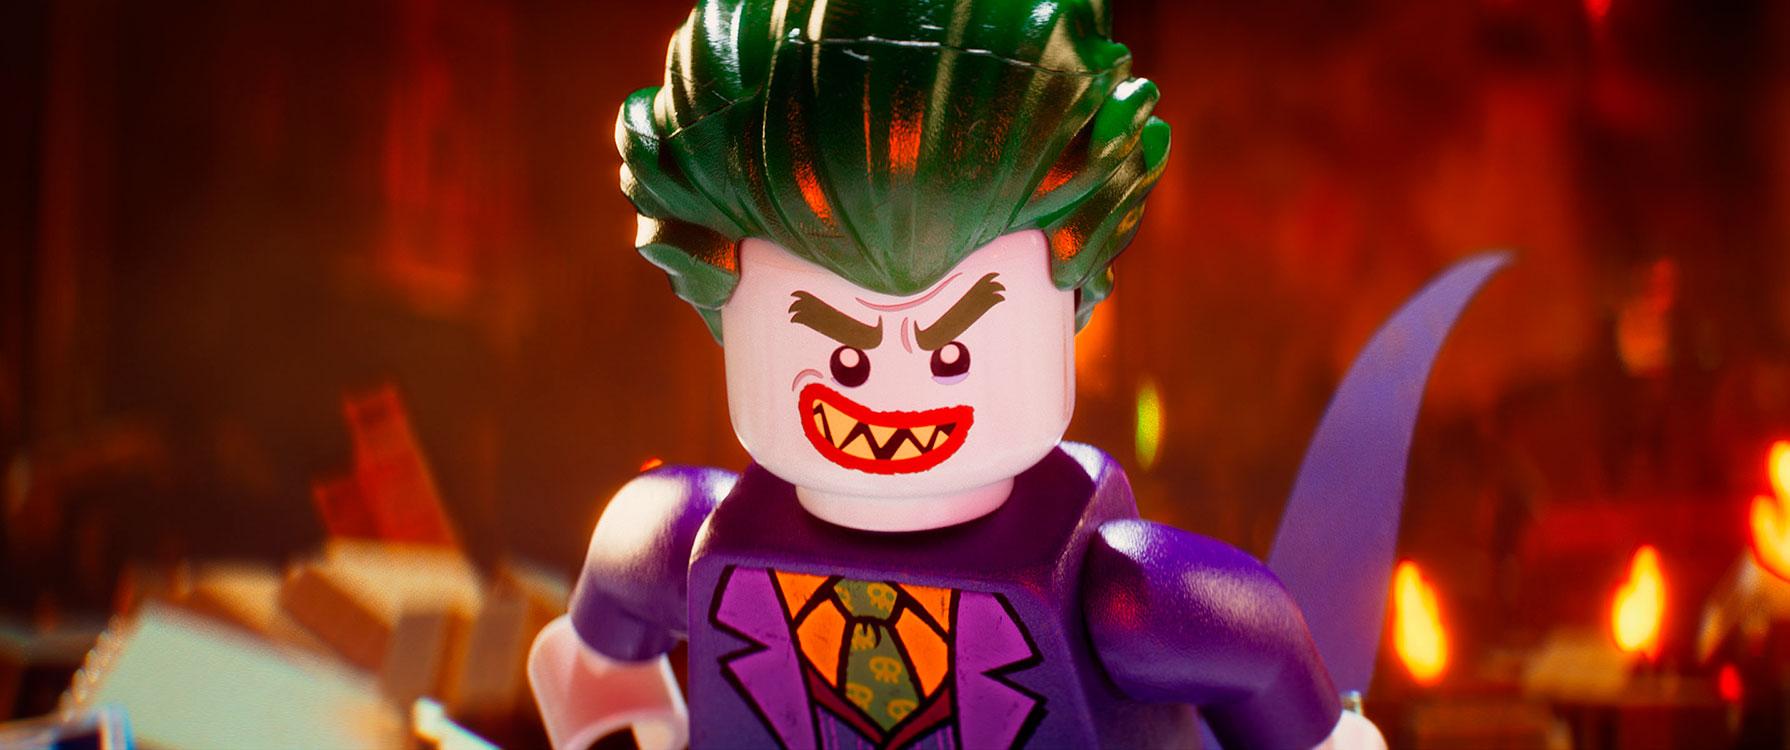 03 LEGO Batman